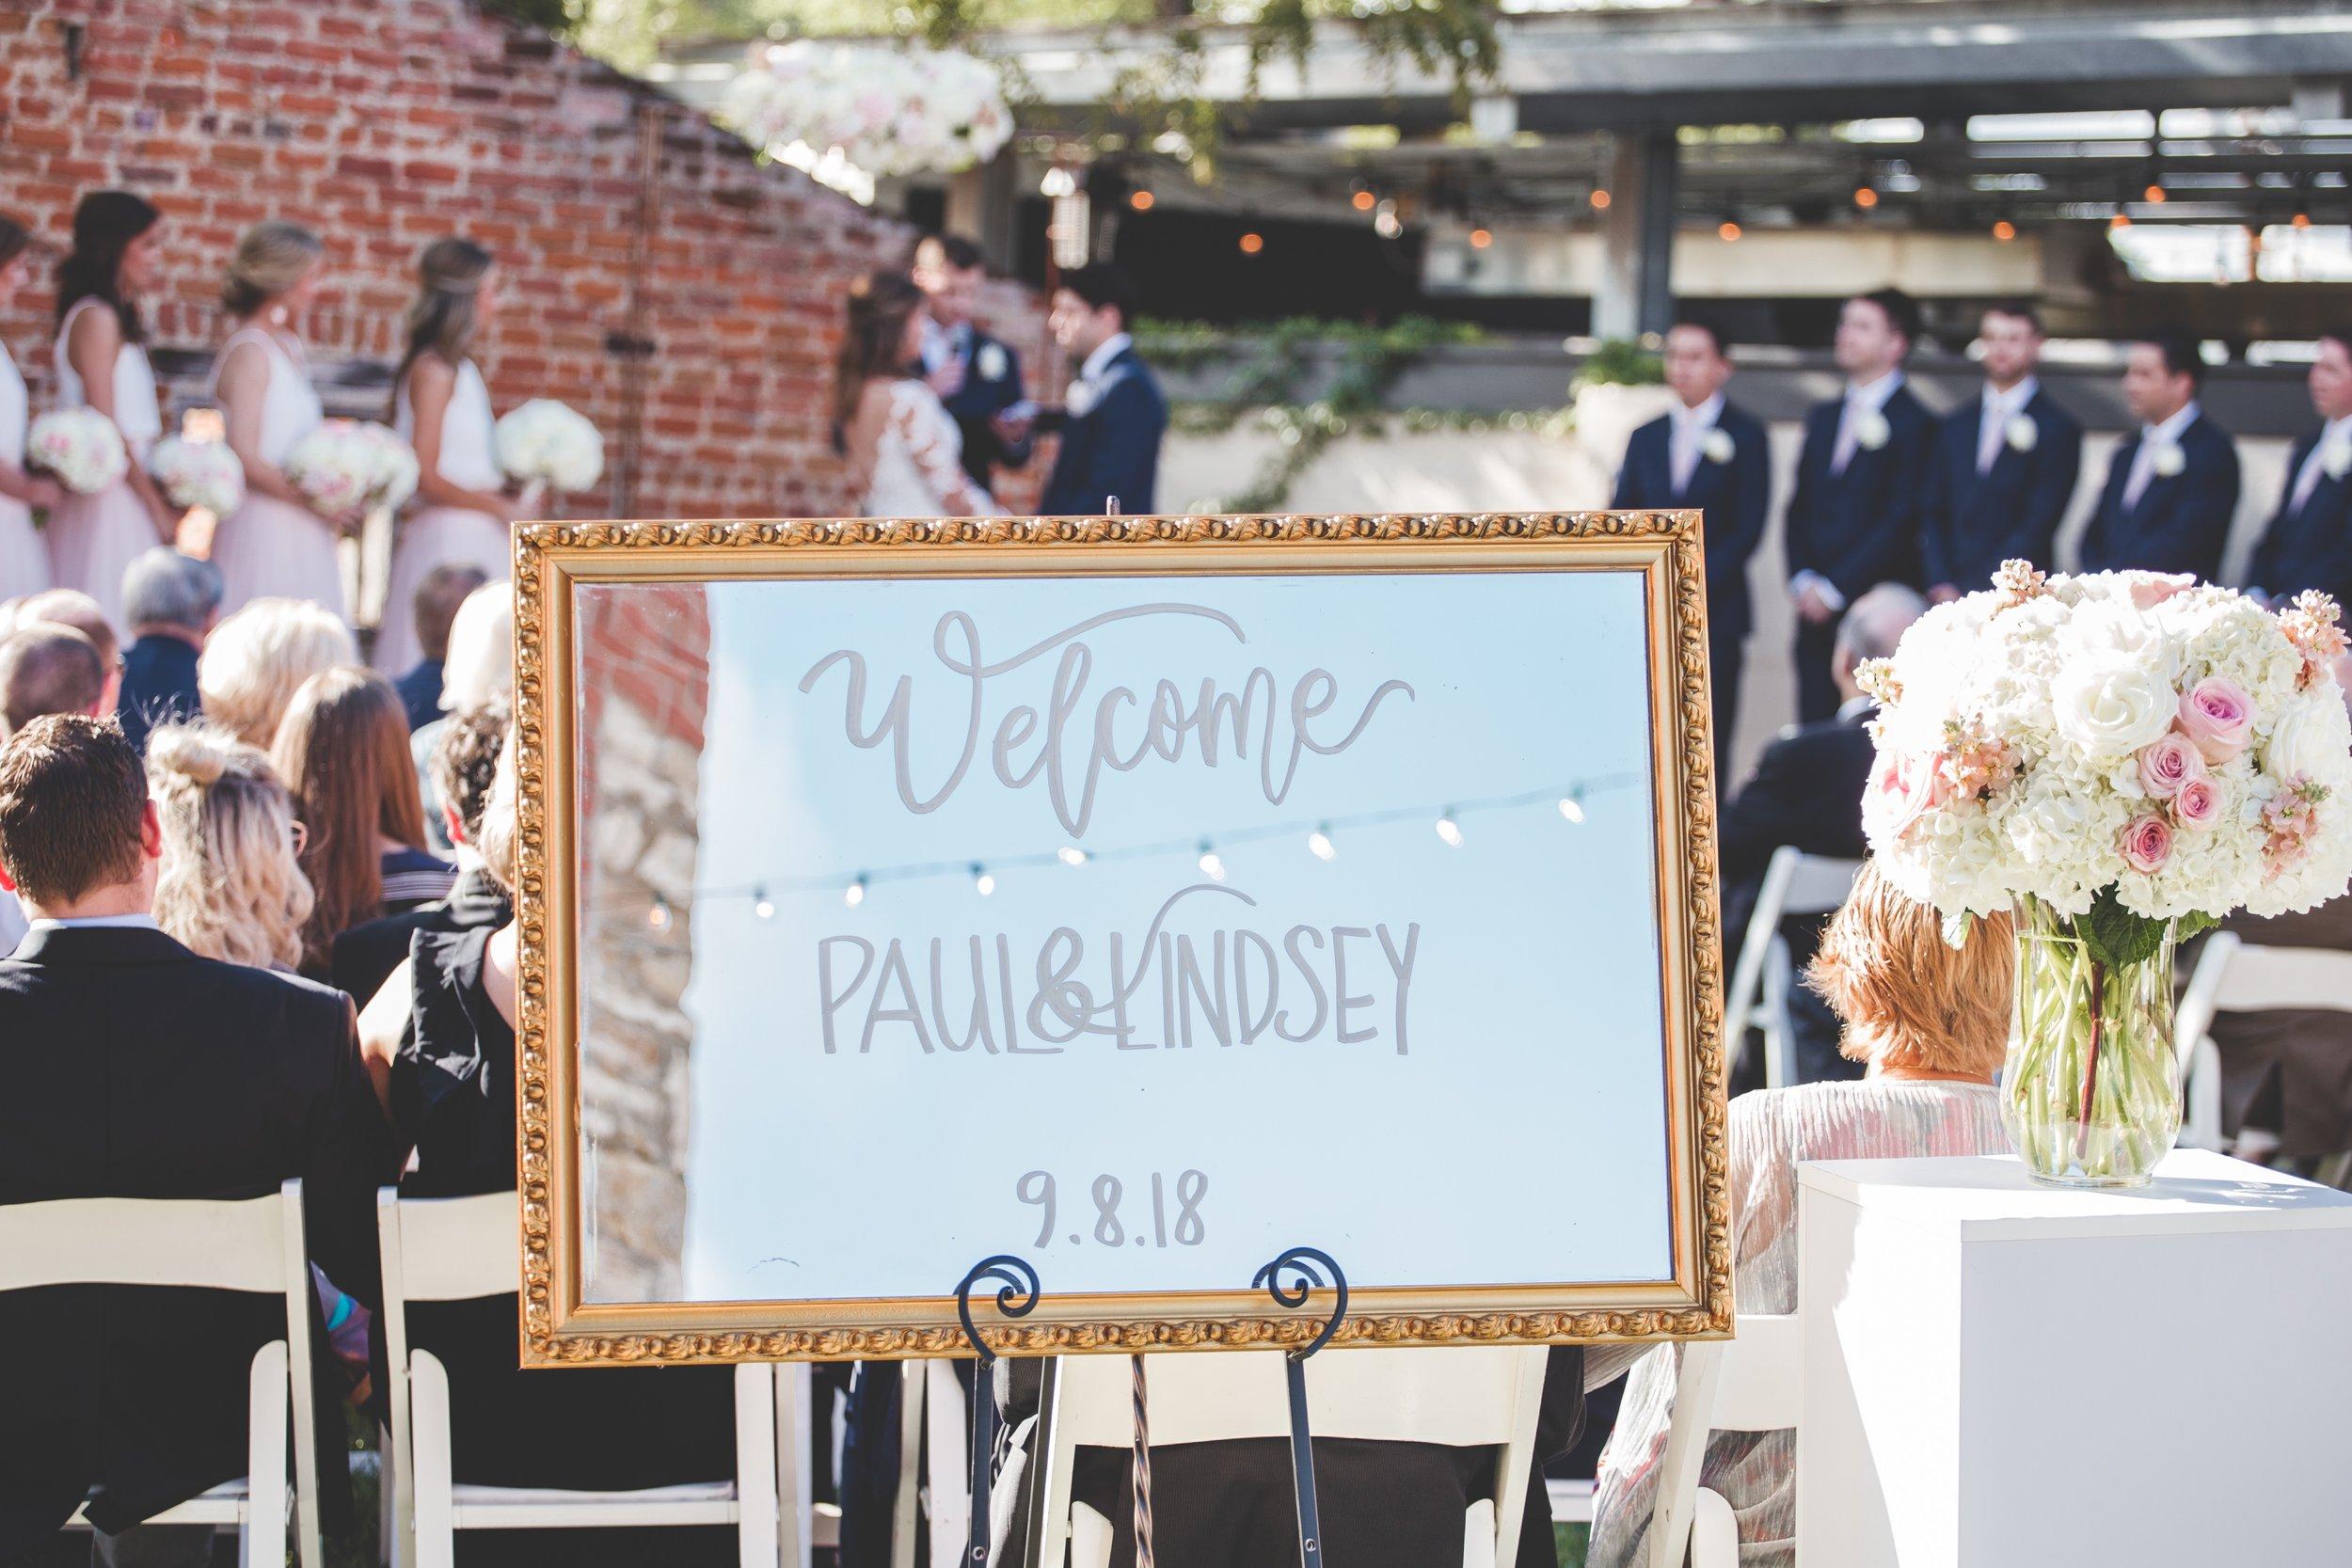 cider-gallery-lawrence-ks-wedding-photographer-jason-domingues-photography-lindsey-paul-0385.jpg